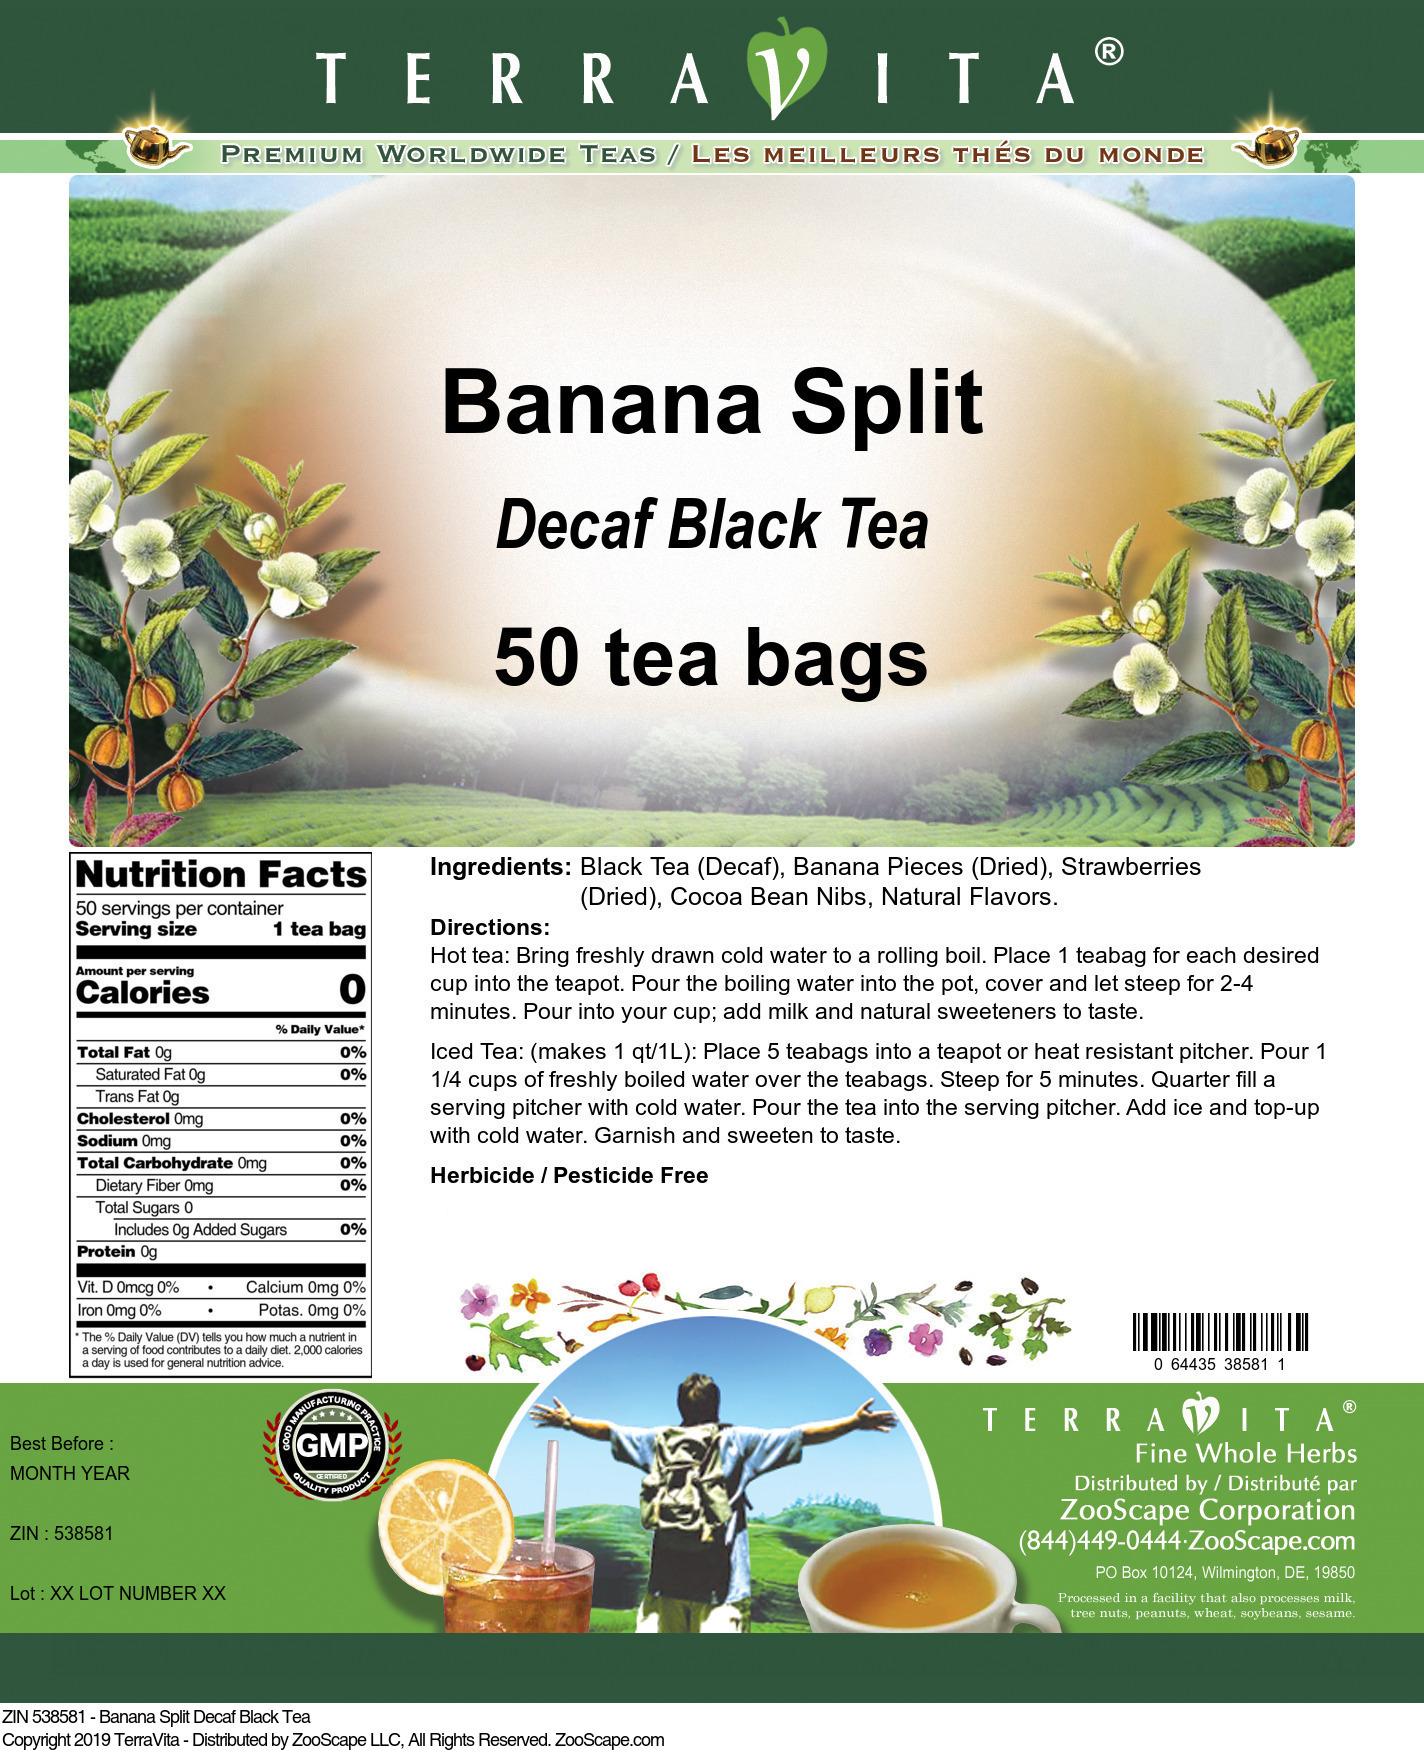 Banana Split Decaf Black Tea